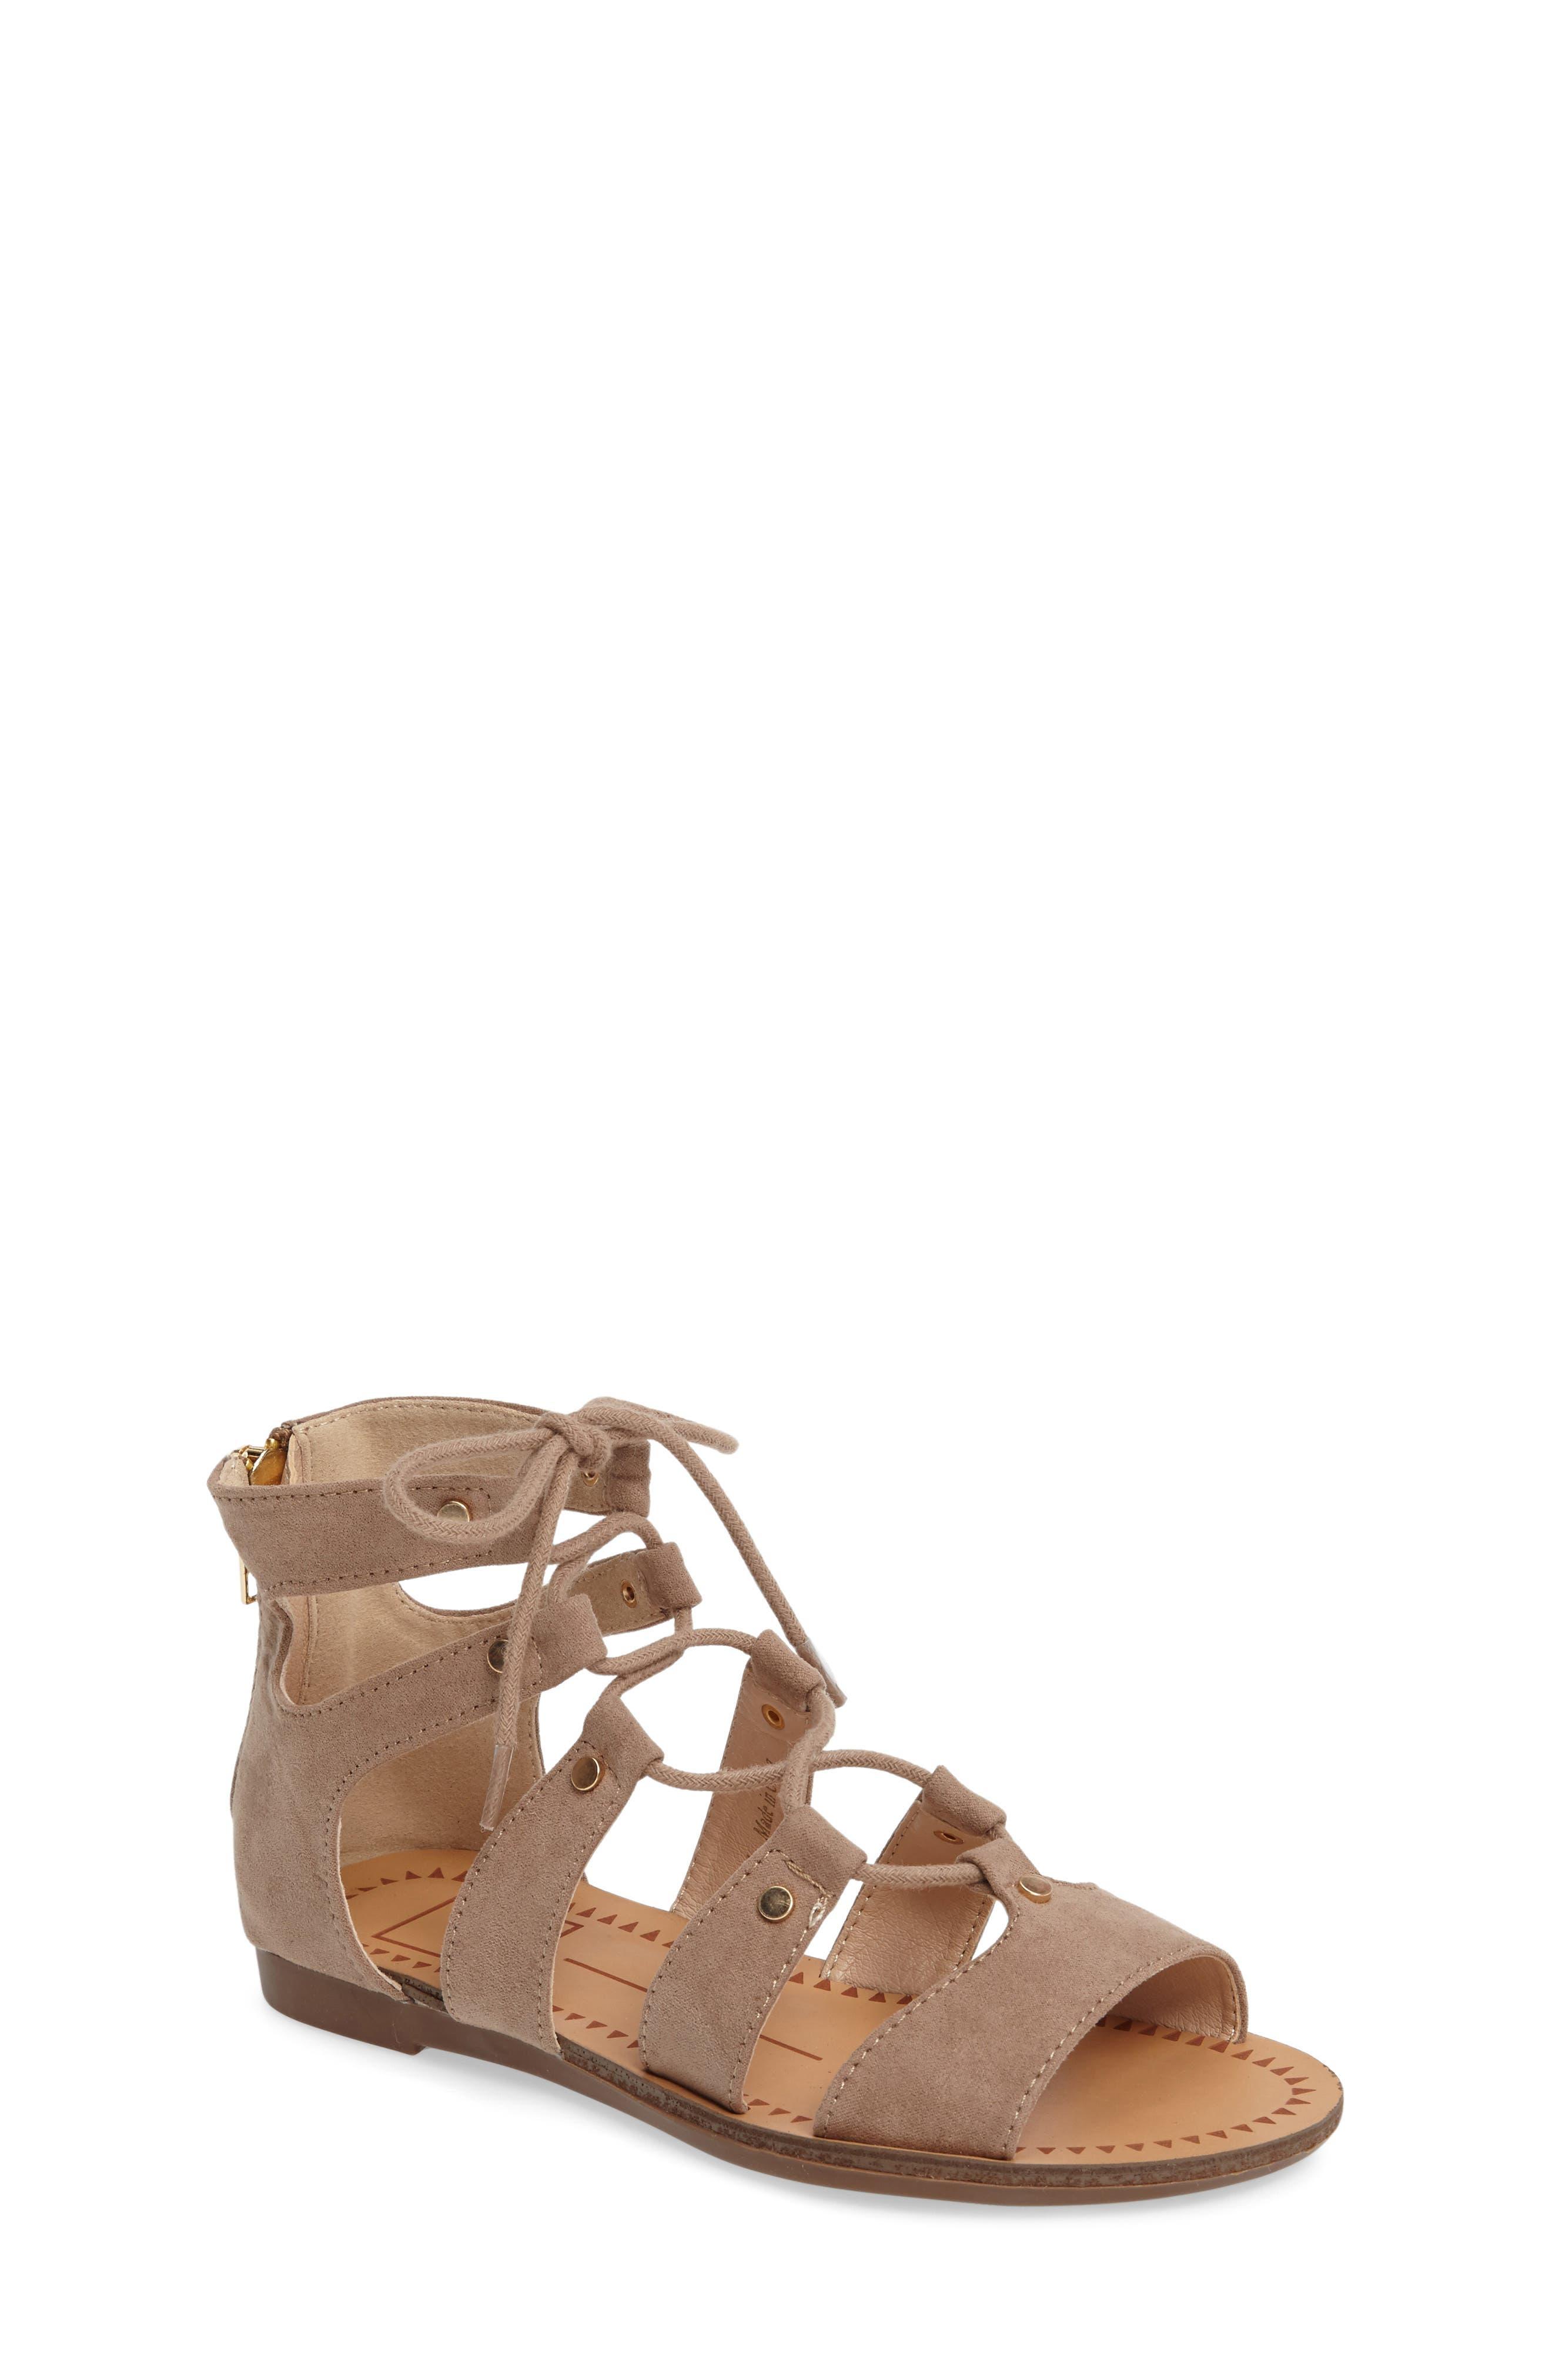 DOLCE VITA FOOTWEAR 'Brooke' Ghillie Sandal